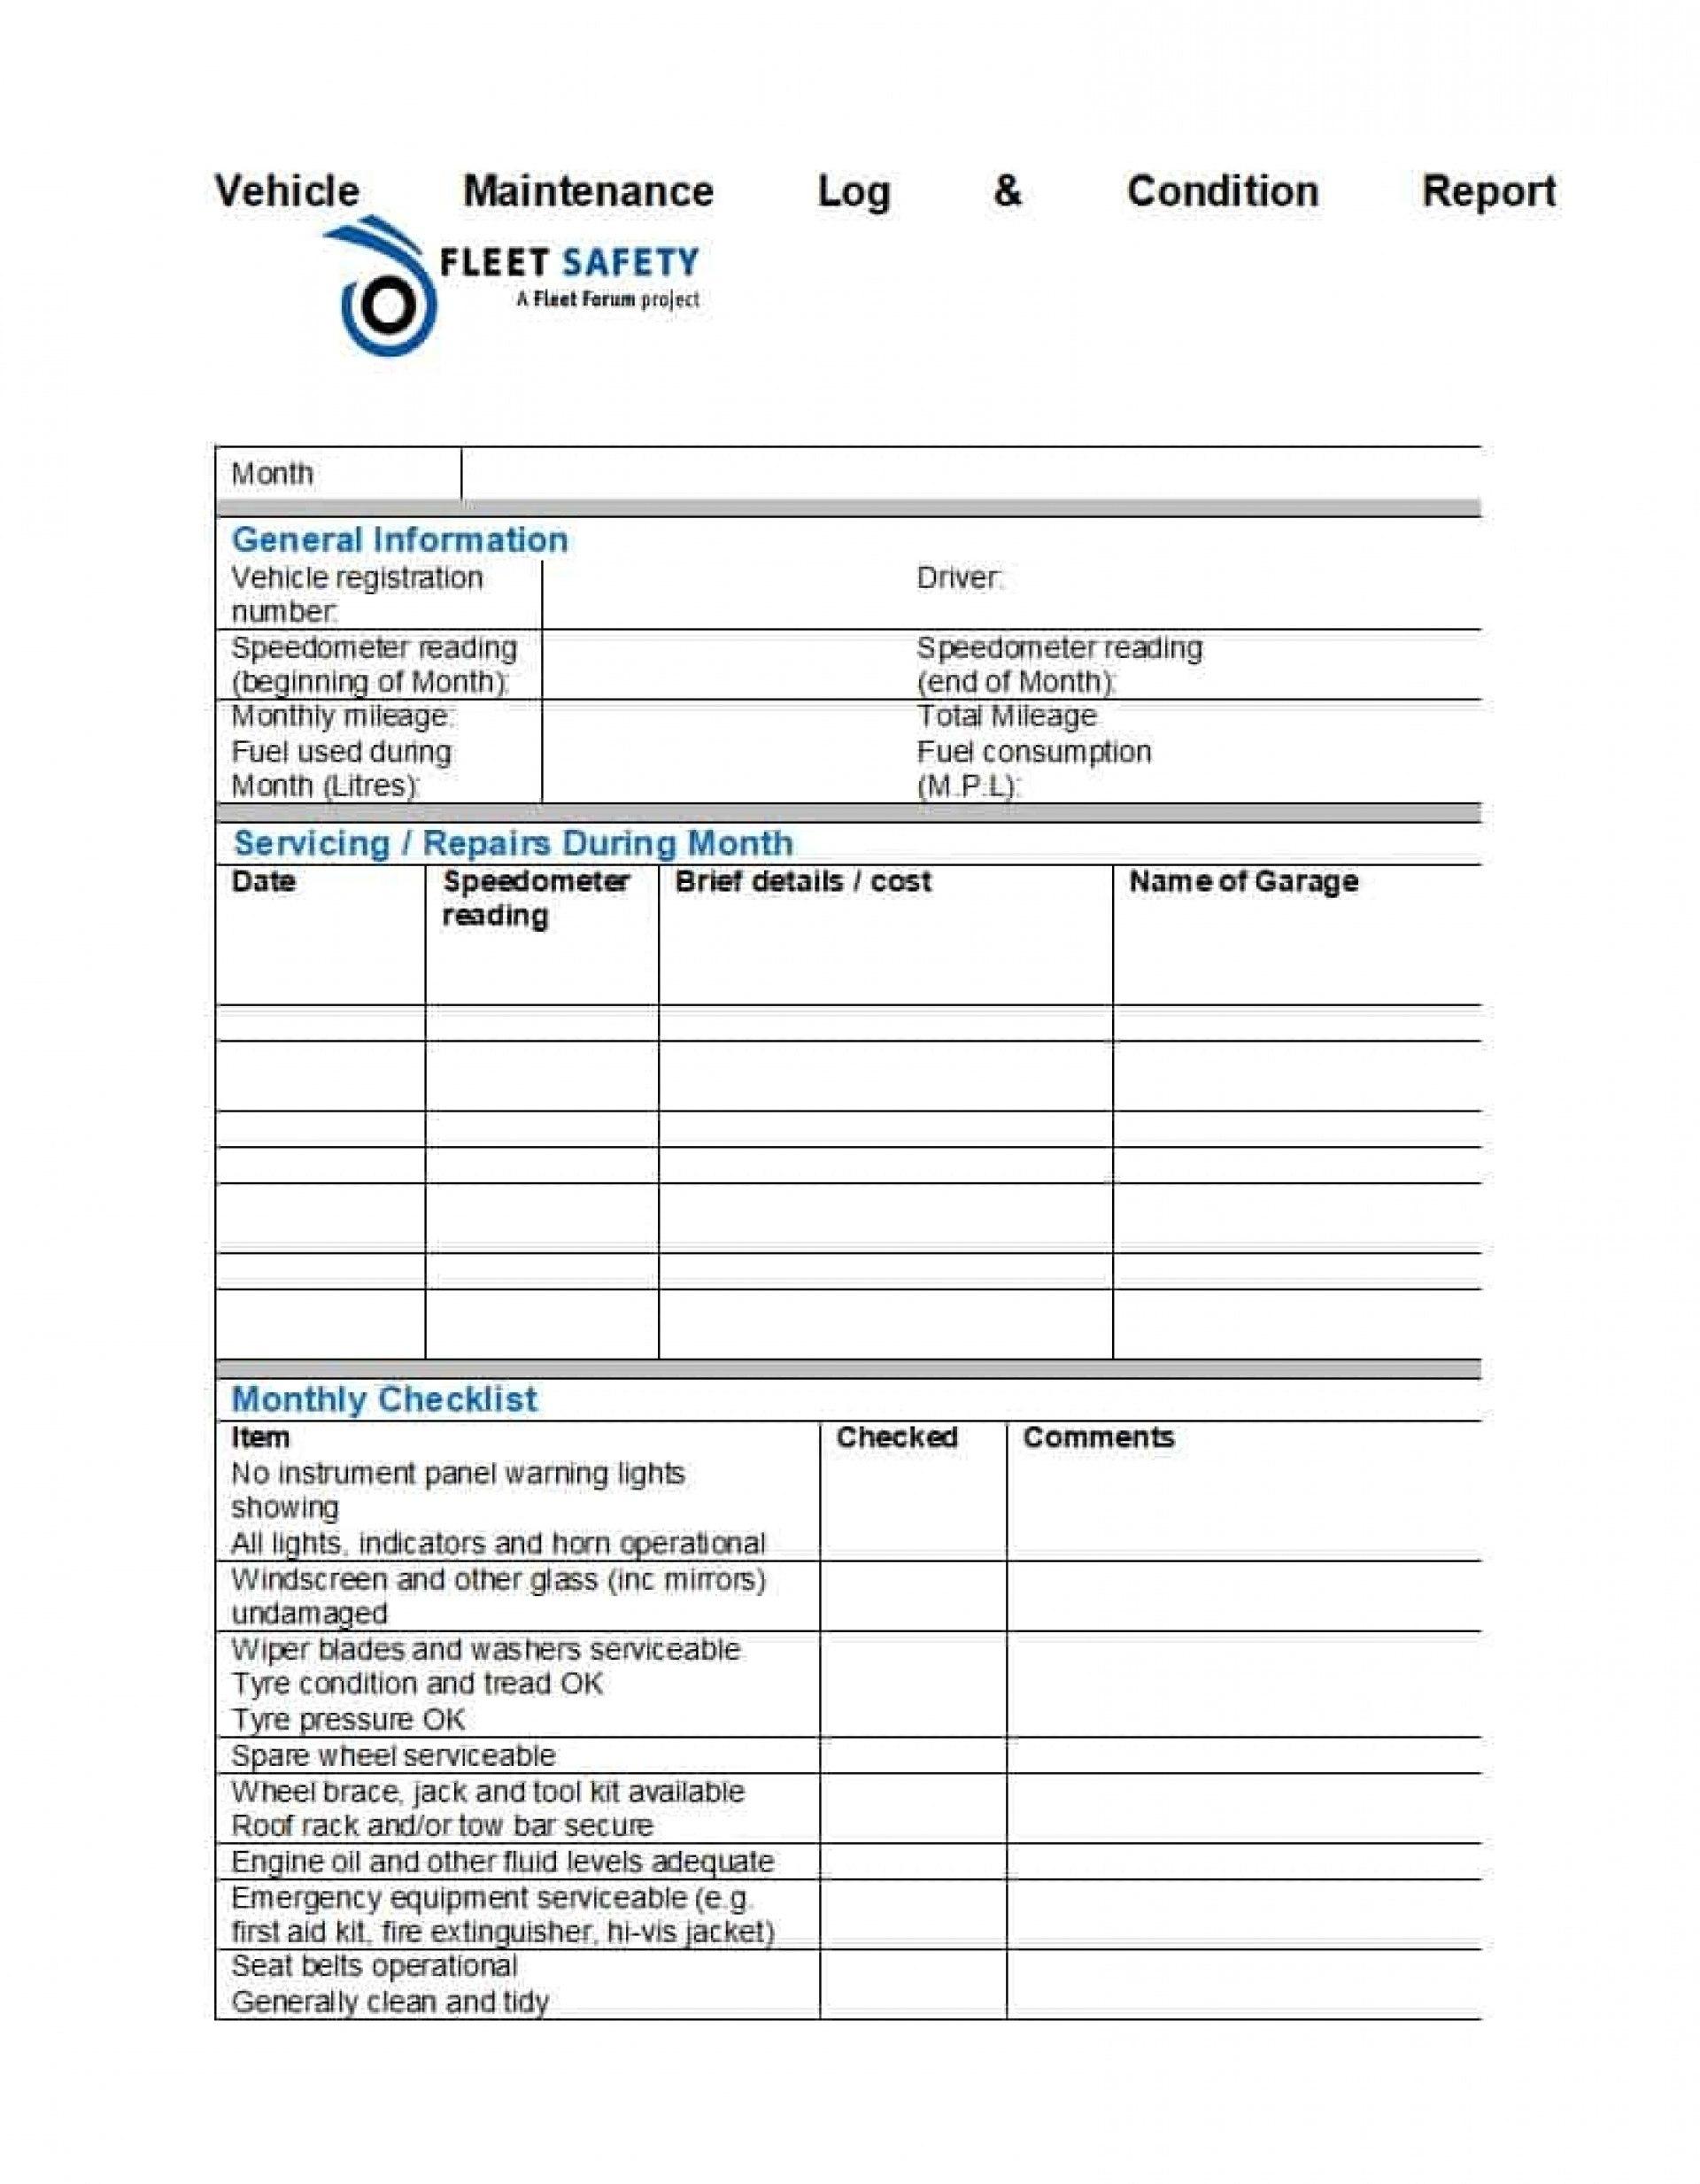 Vehicle Fleet Management Spreadsheet Auto Maintenance Schedule Within Fleet Management Report Template